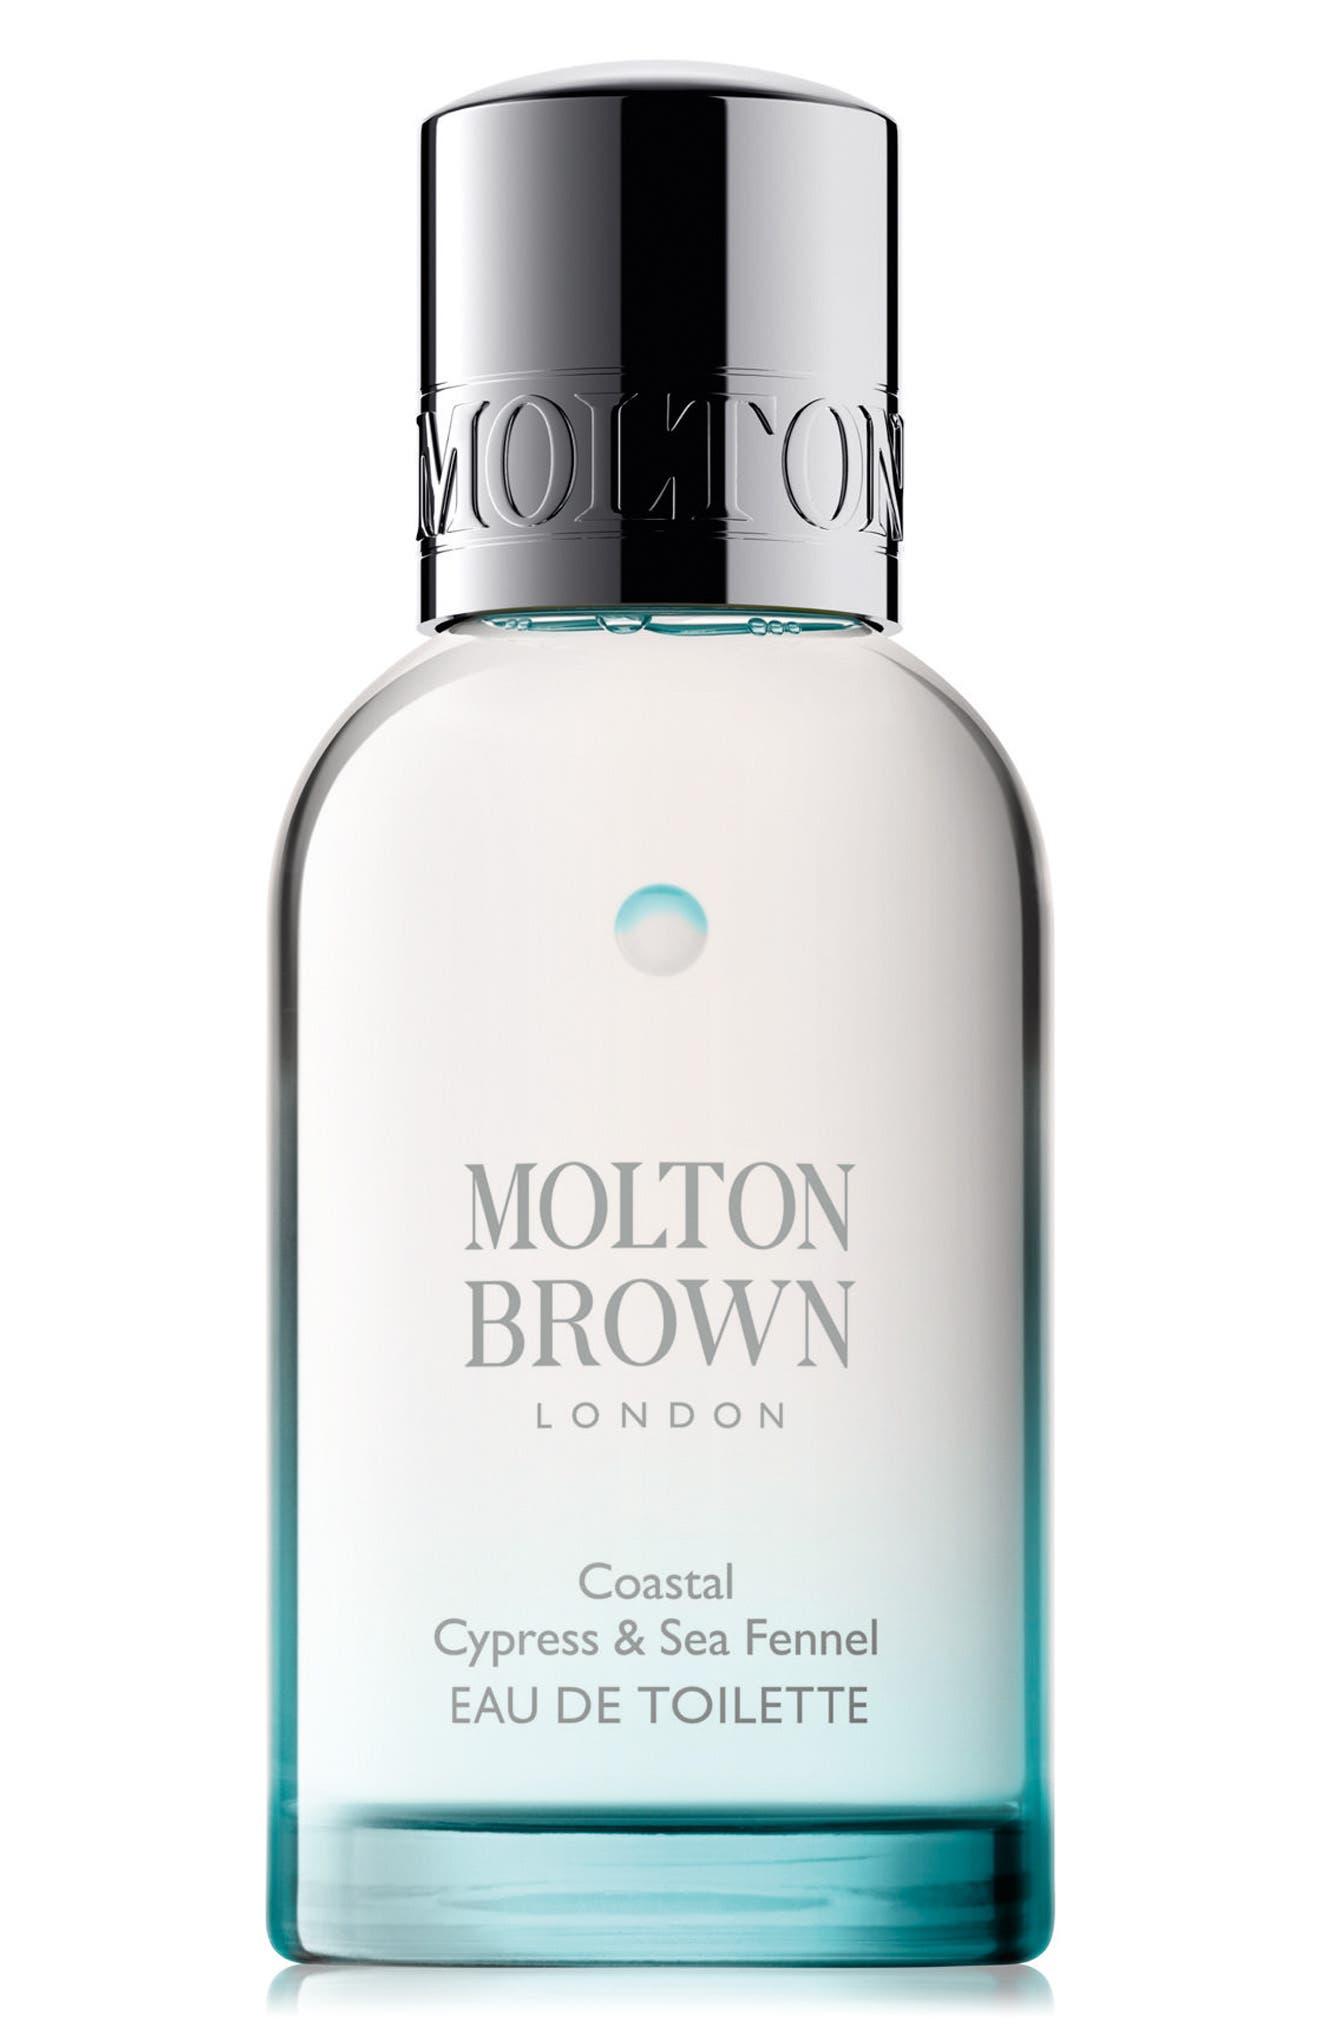 Main Image - MOLTON BROWN London Coastal Cypress & Sea Fennel Eau de Toilette